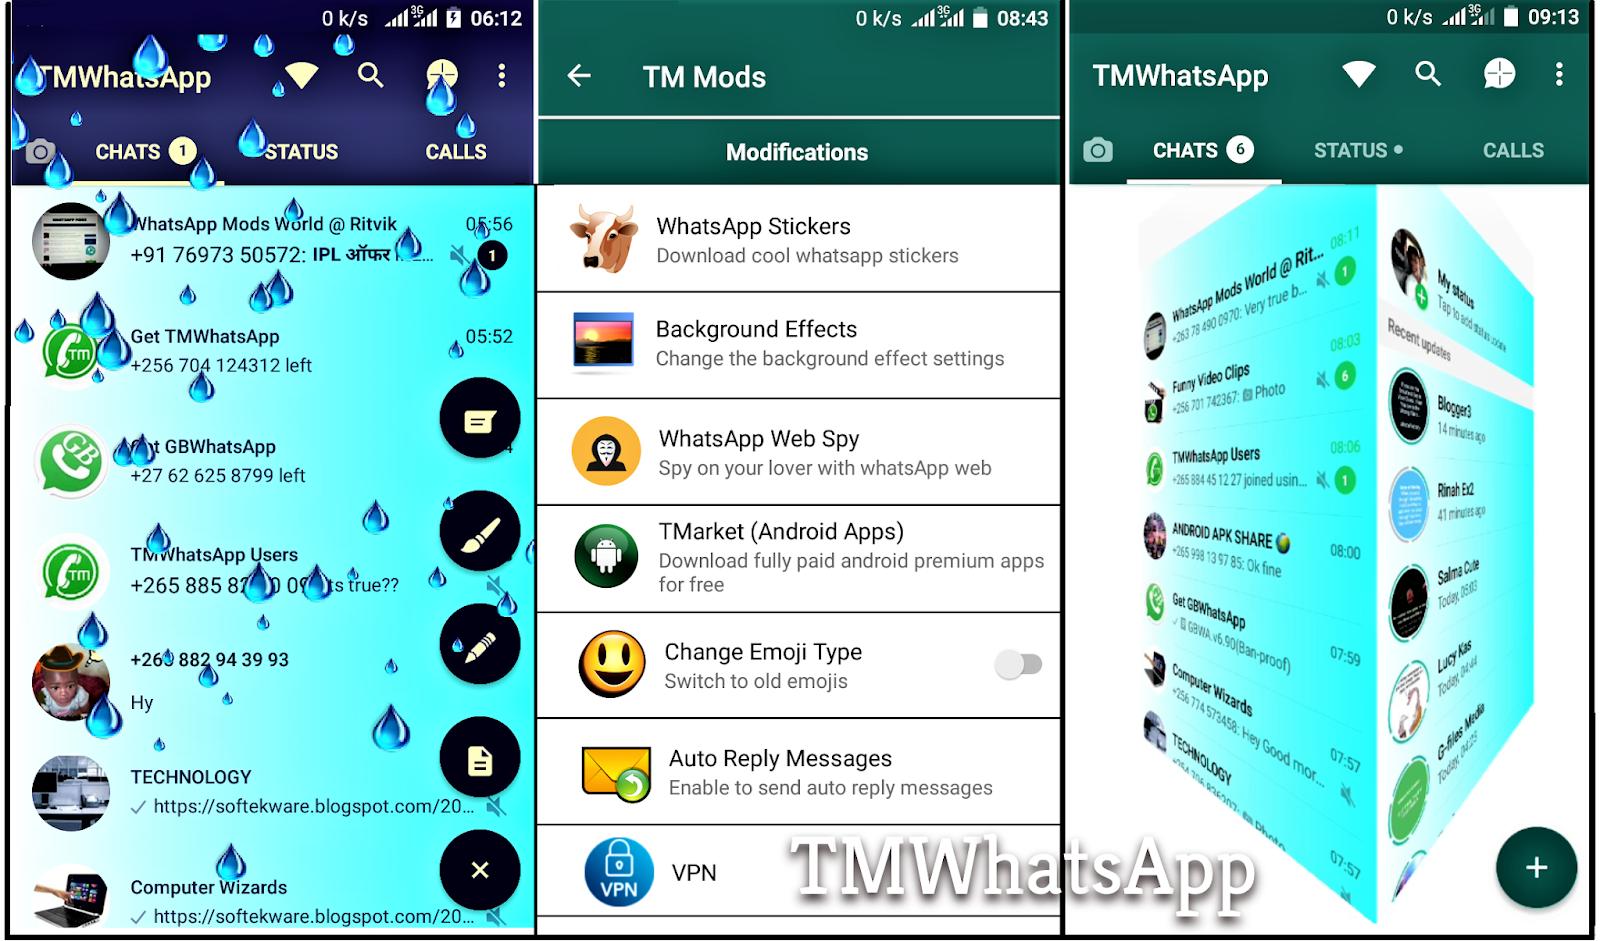 Softek IT Consult: TMWhatsApp v7 40 (Anti-Ban Version)